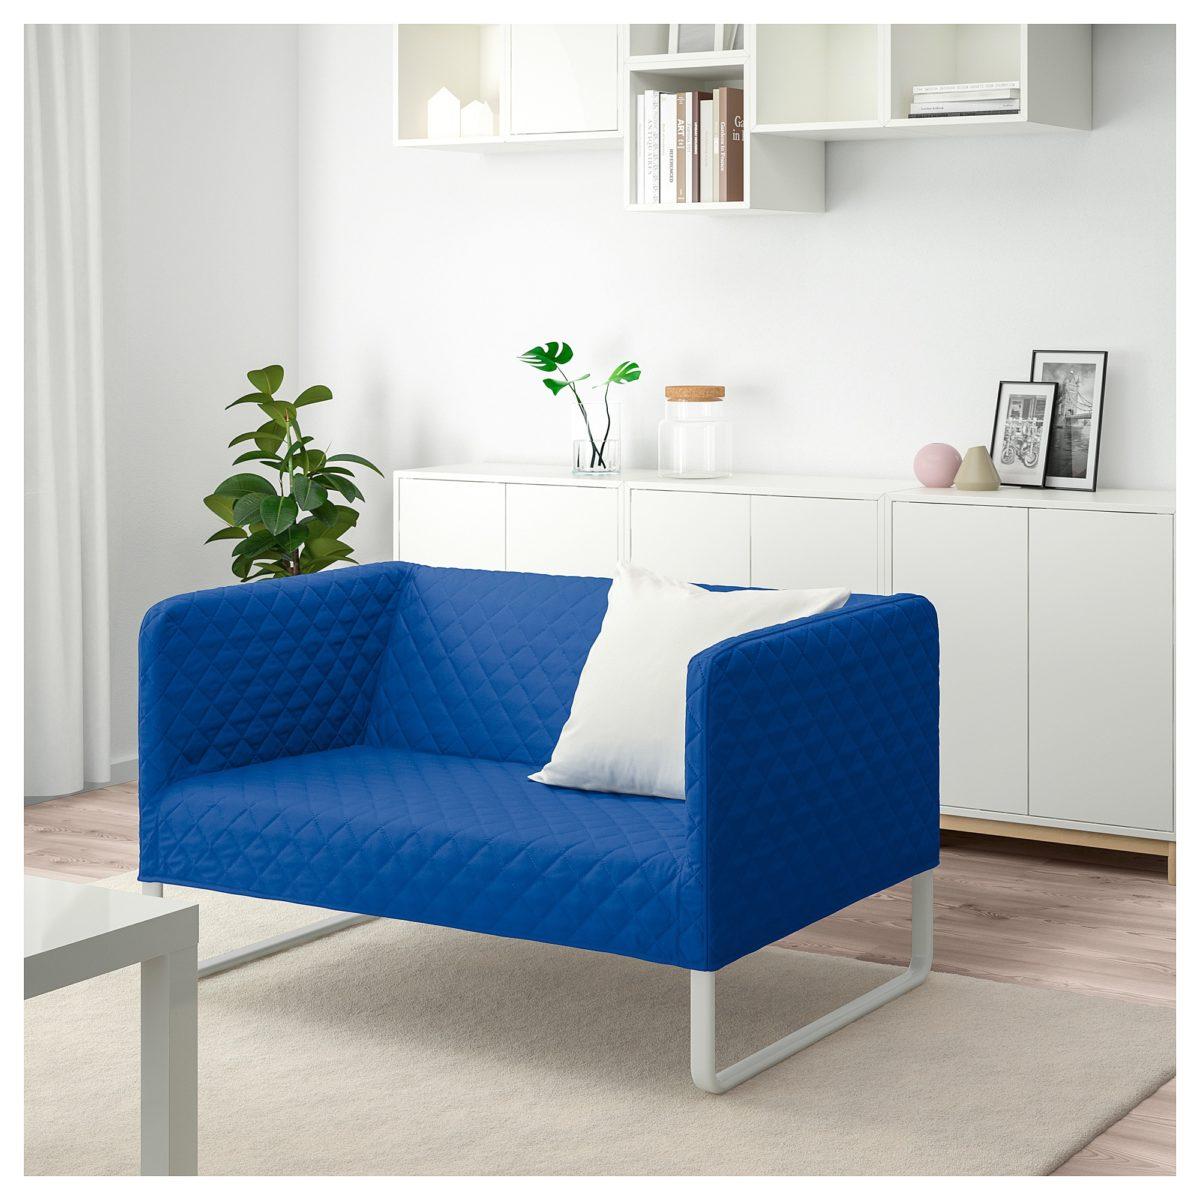 Divani Ikea 2019